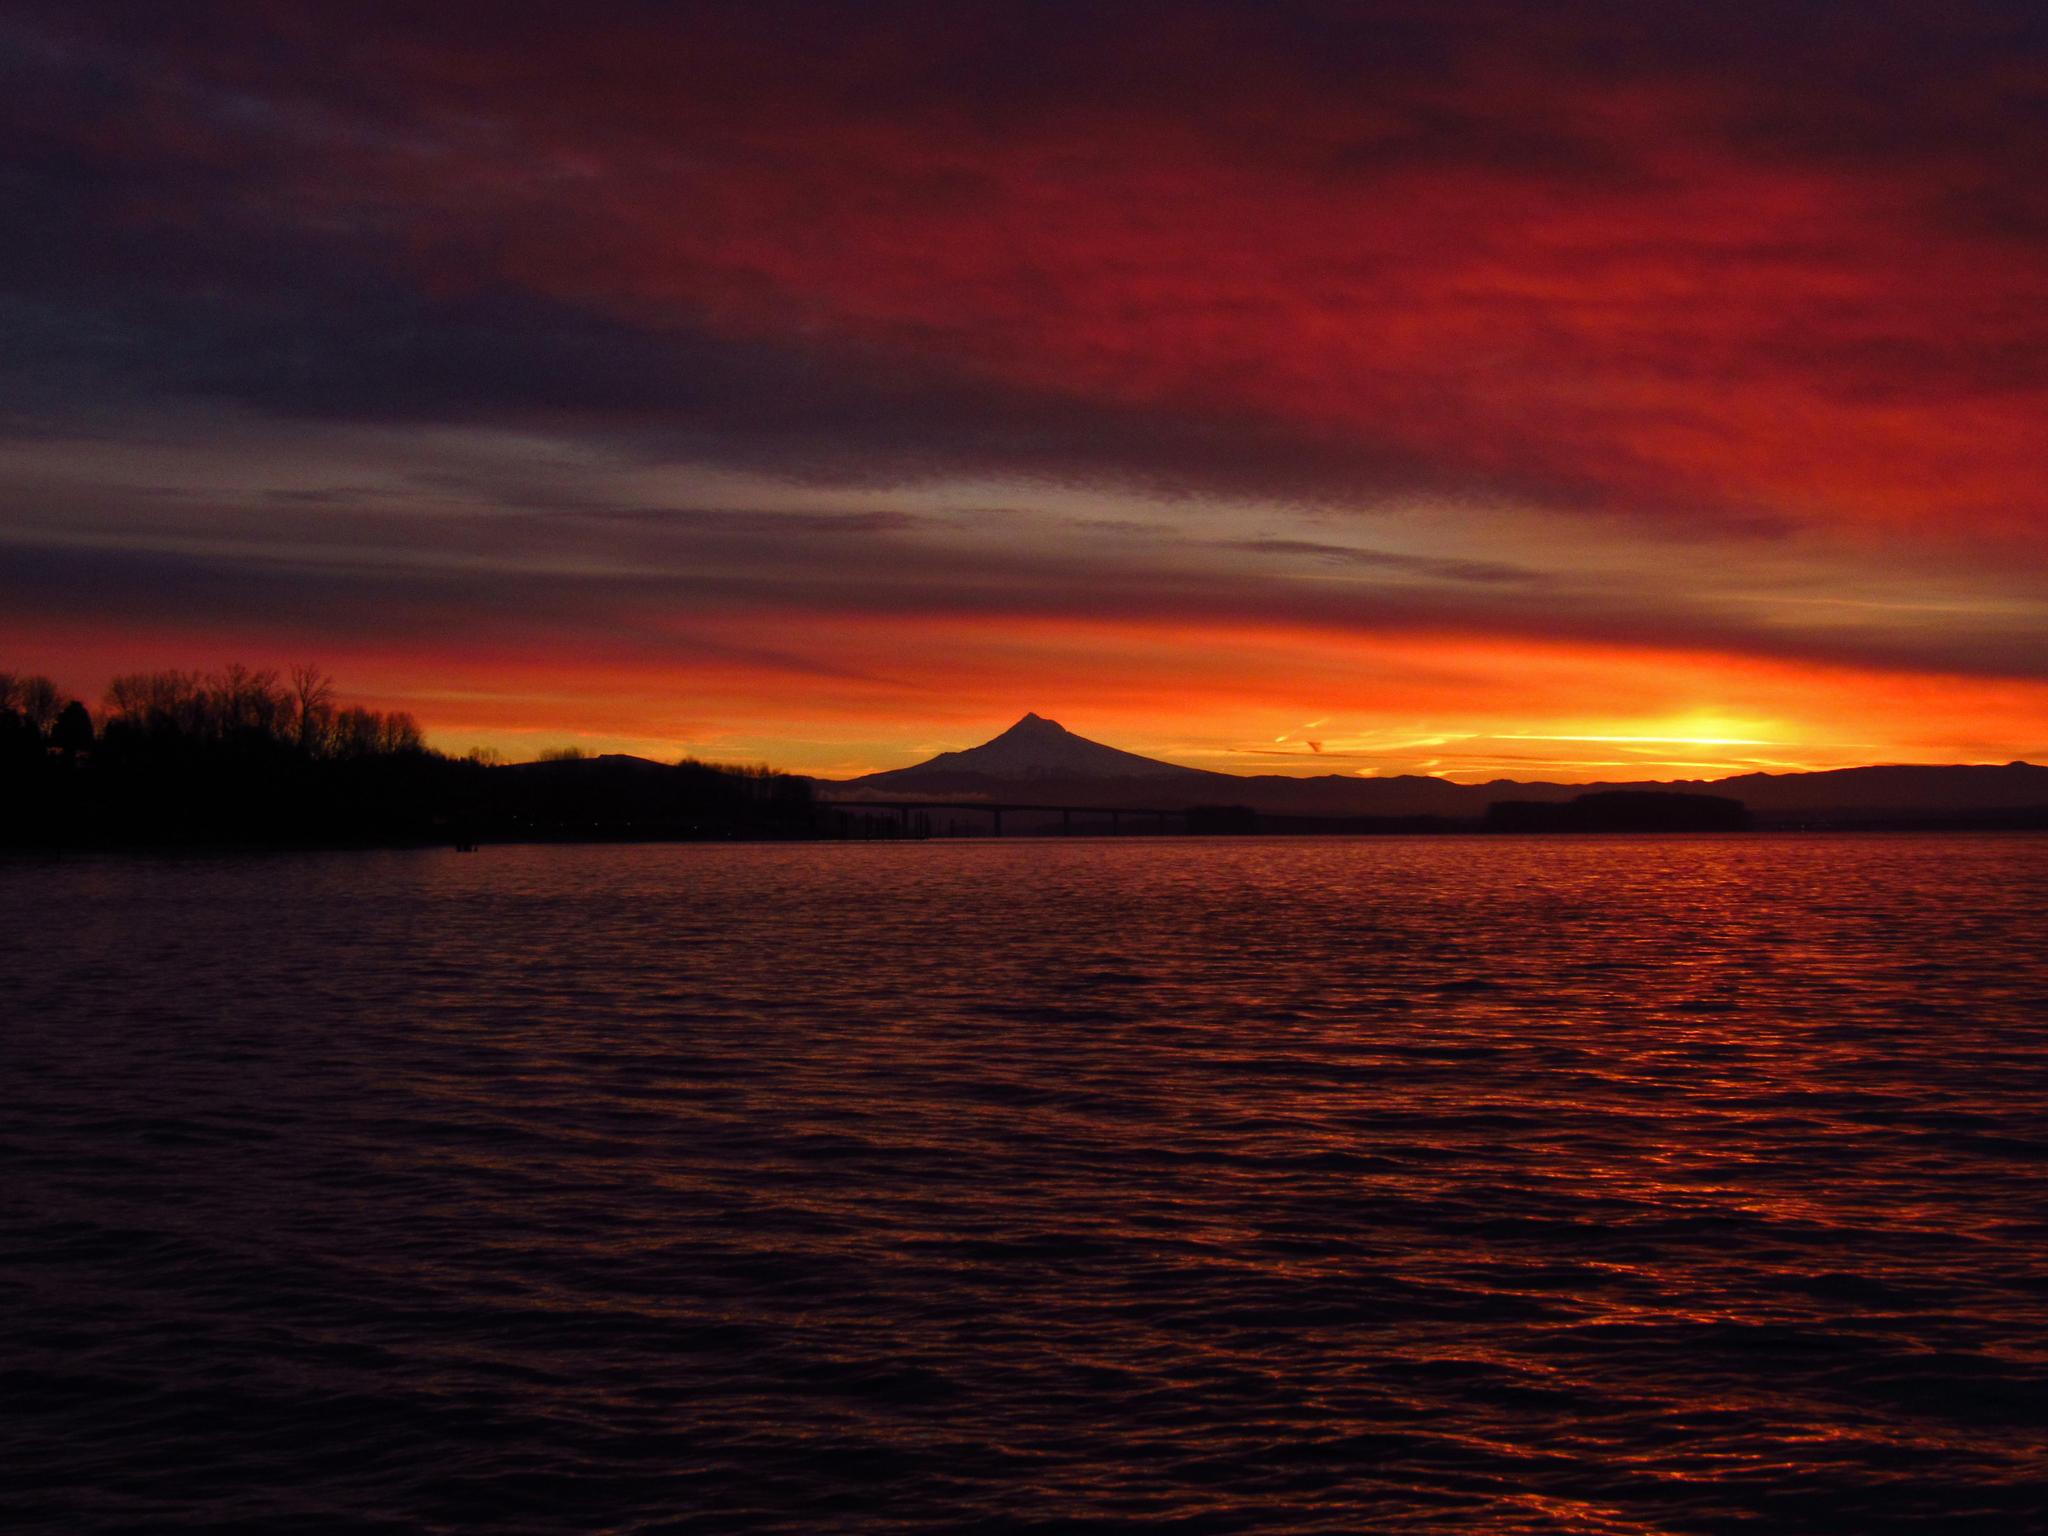 A beautiful sunset at eagle mountain lake. Download Mountain Lake Sunset Royalty Free Stock Photo And Image